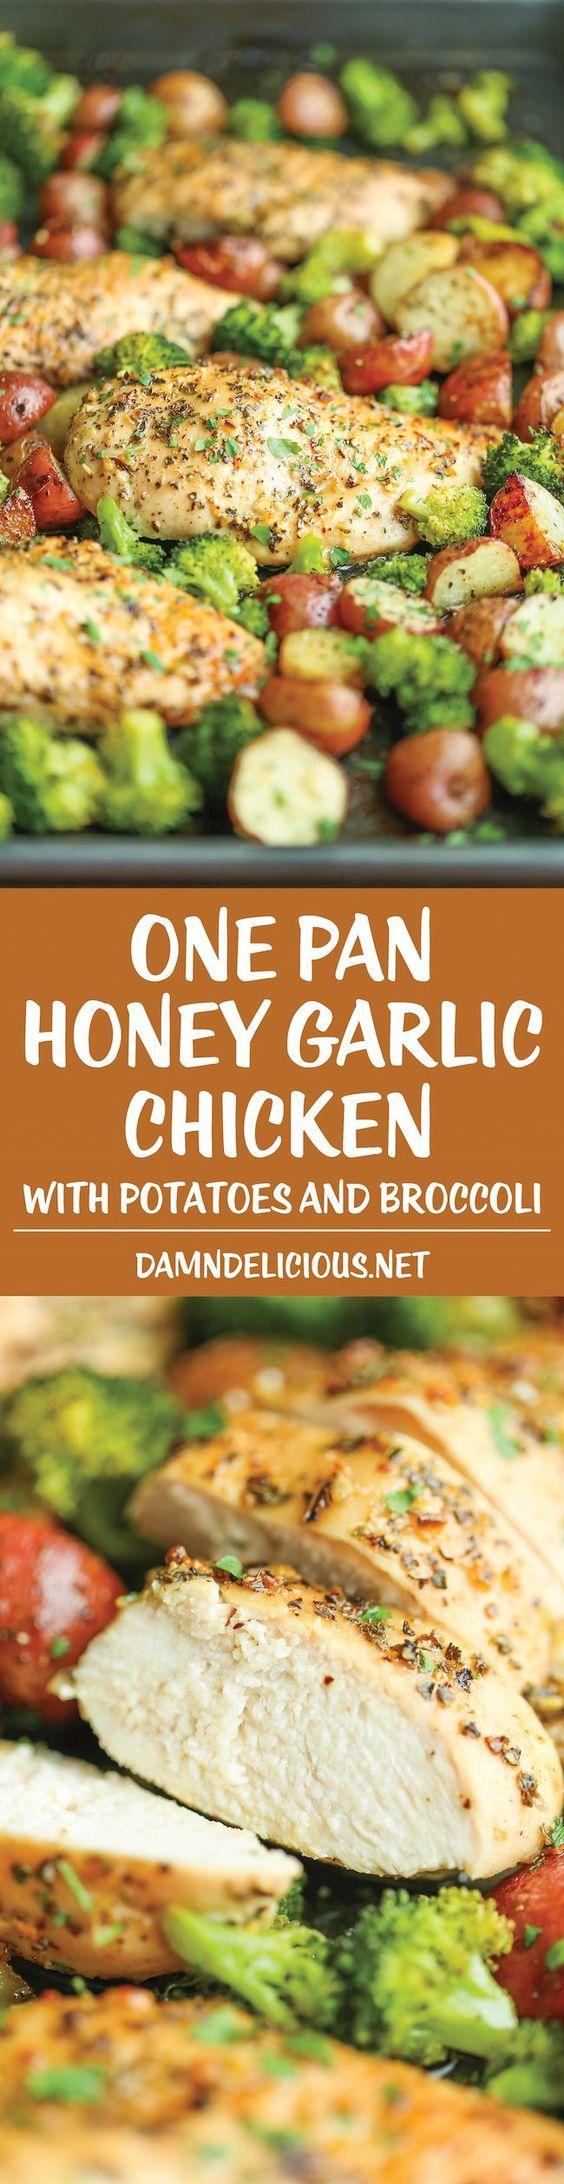 One Pan Honey Garlic Chicken and Veggies - food recipe Share and Enjoy! #anastasiadate